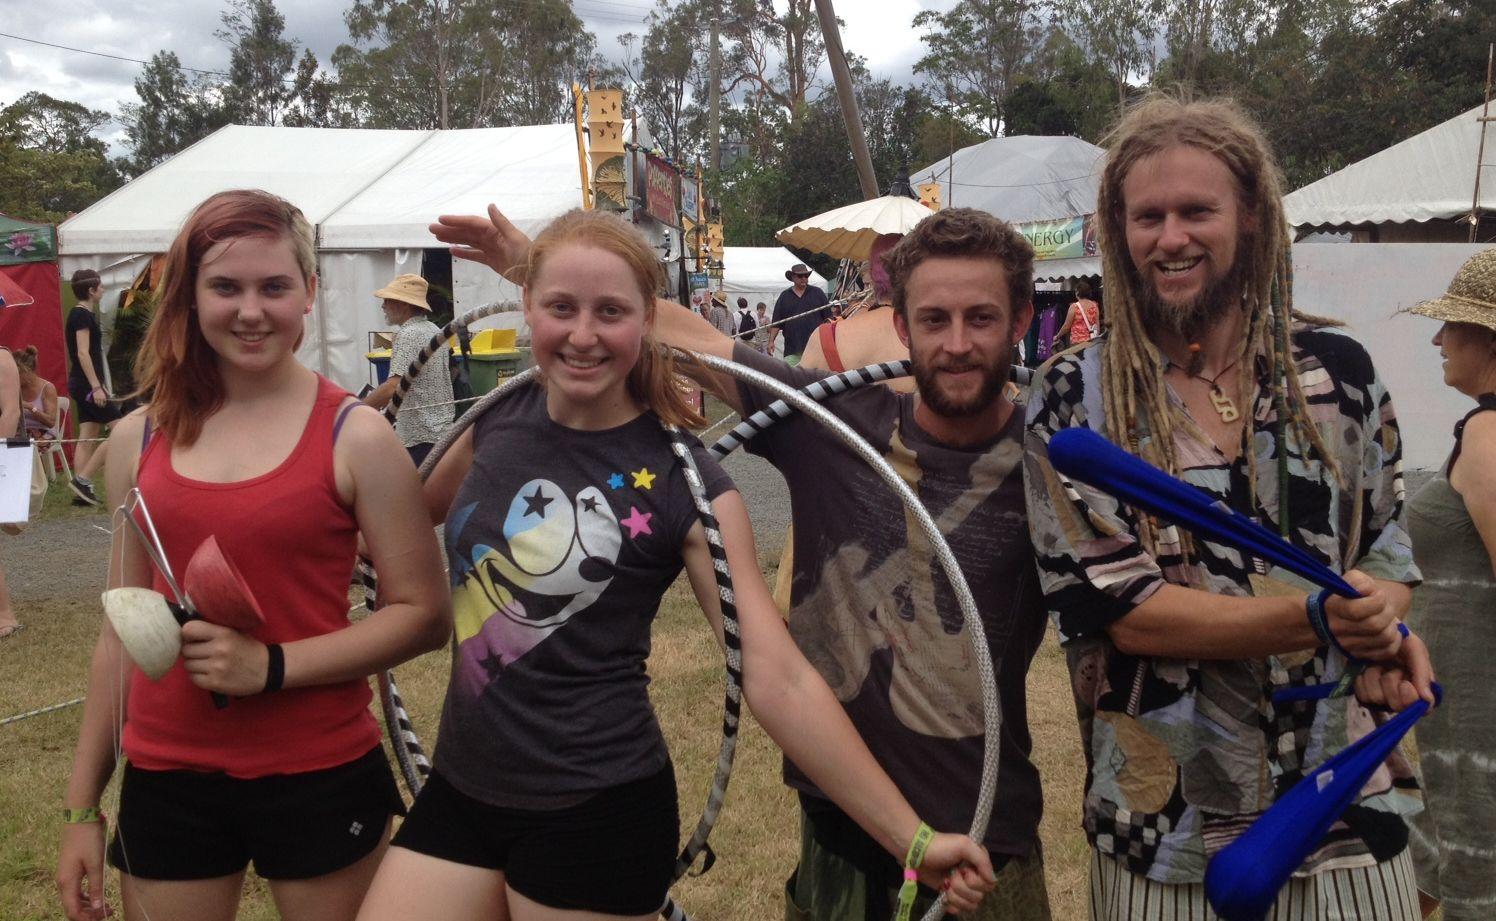 Marina Gelmann, Lisa Goldsworthy, Mark Treloar, and Jeremy Edwards at day one of the Woodford Folk Festival 2012.